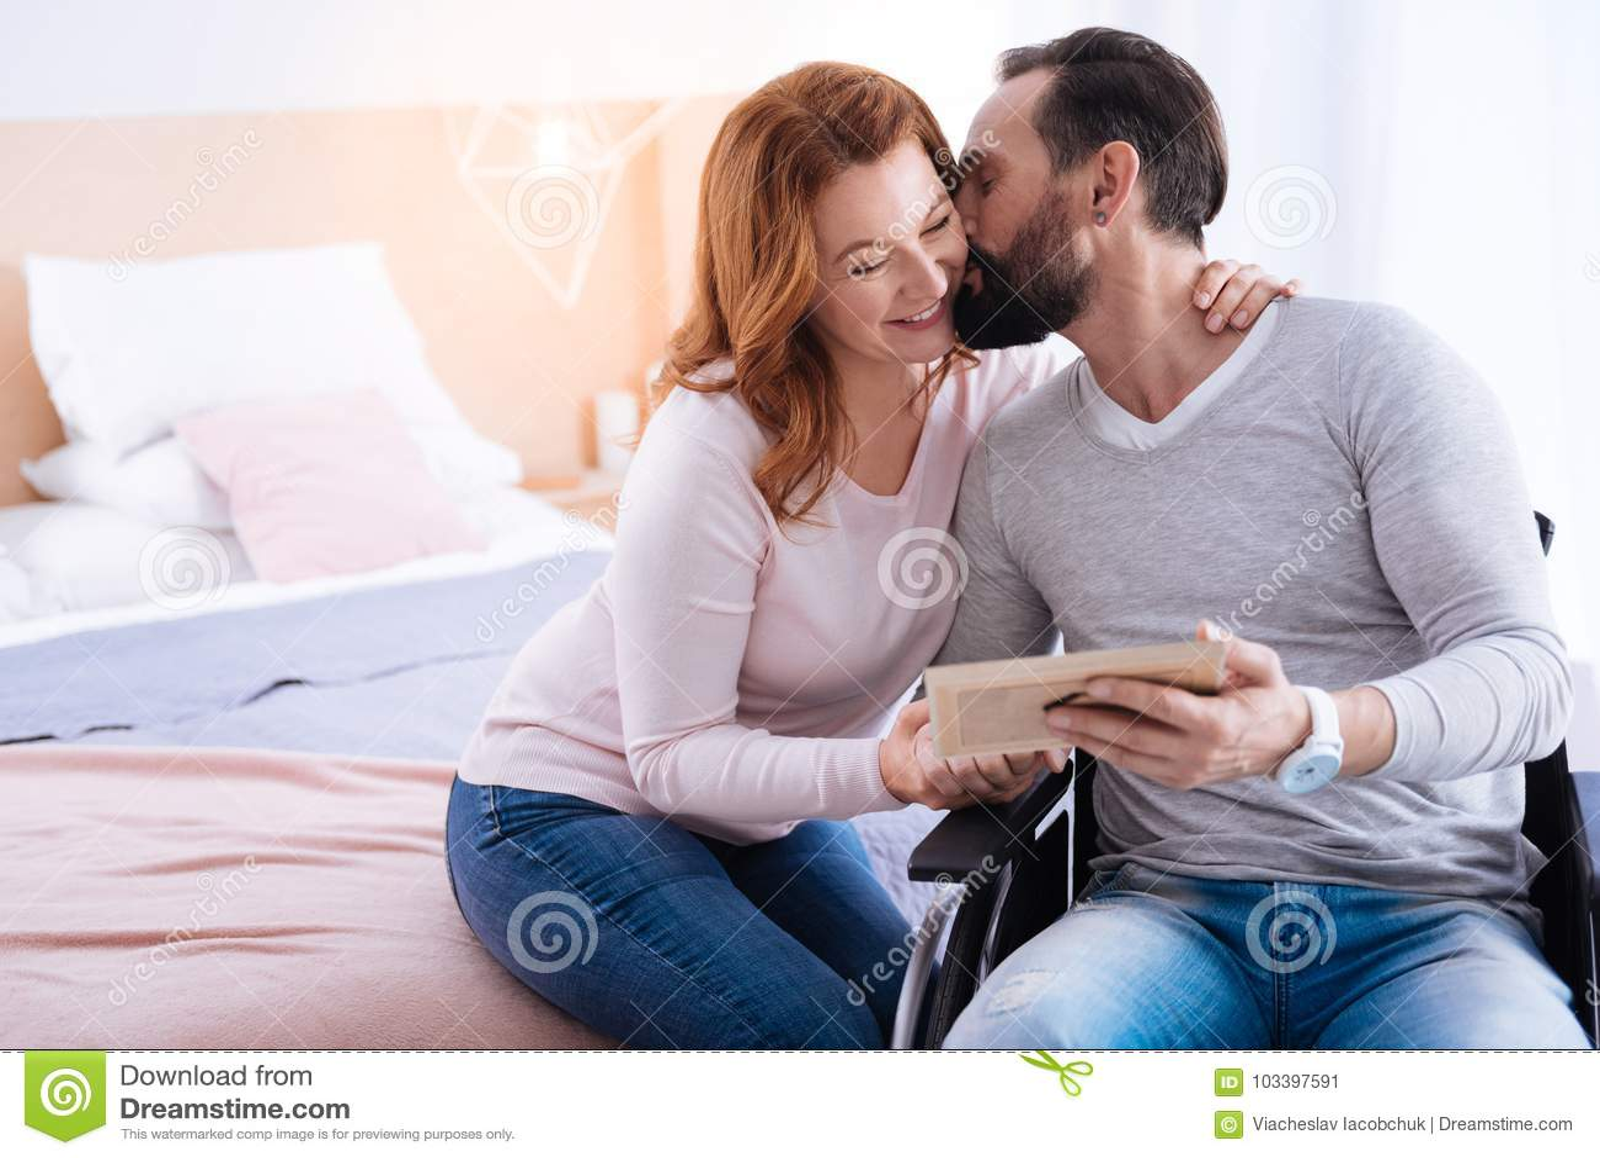 Dating verlamd man